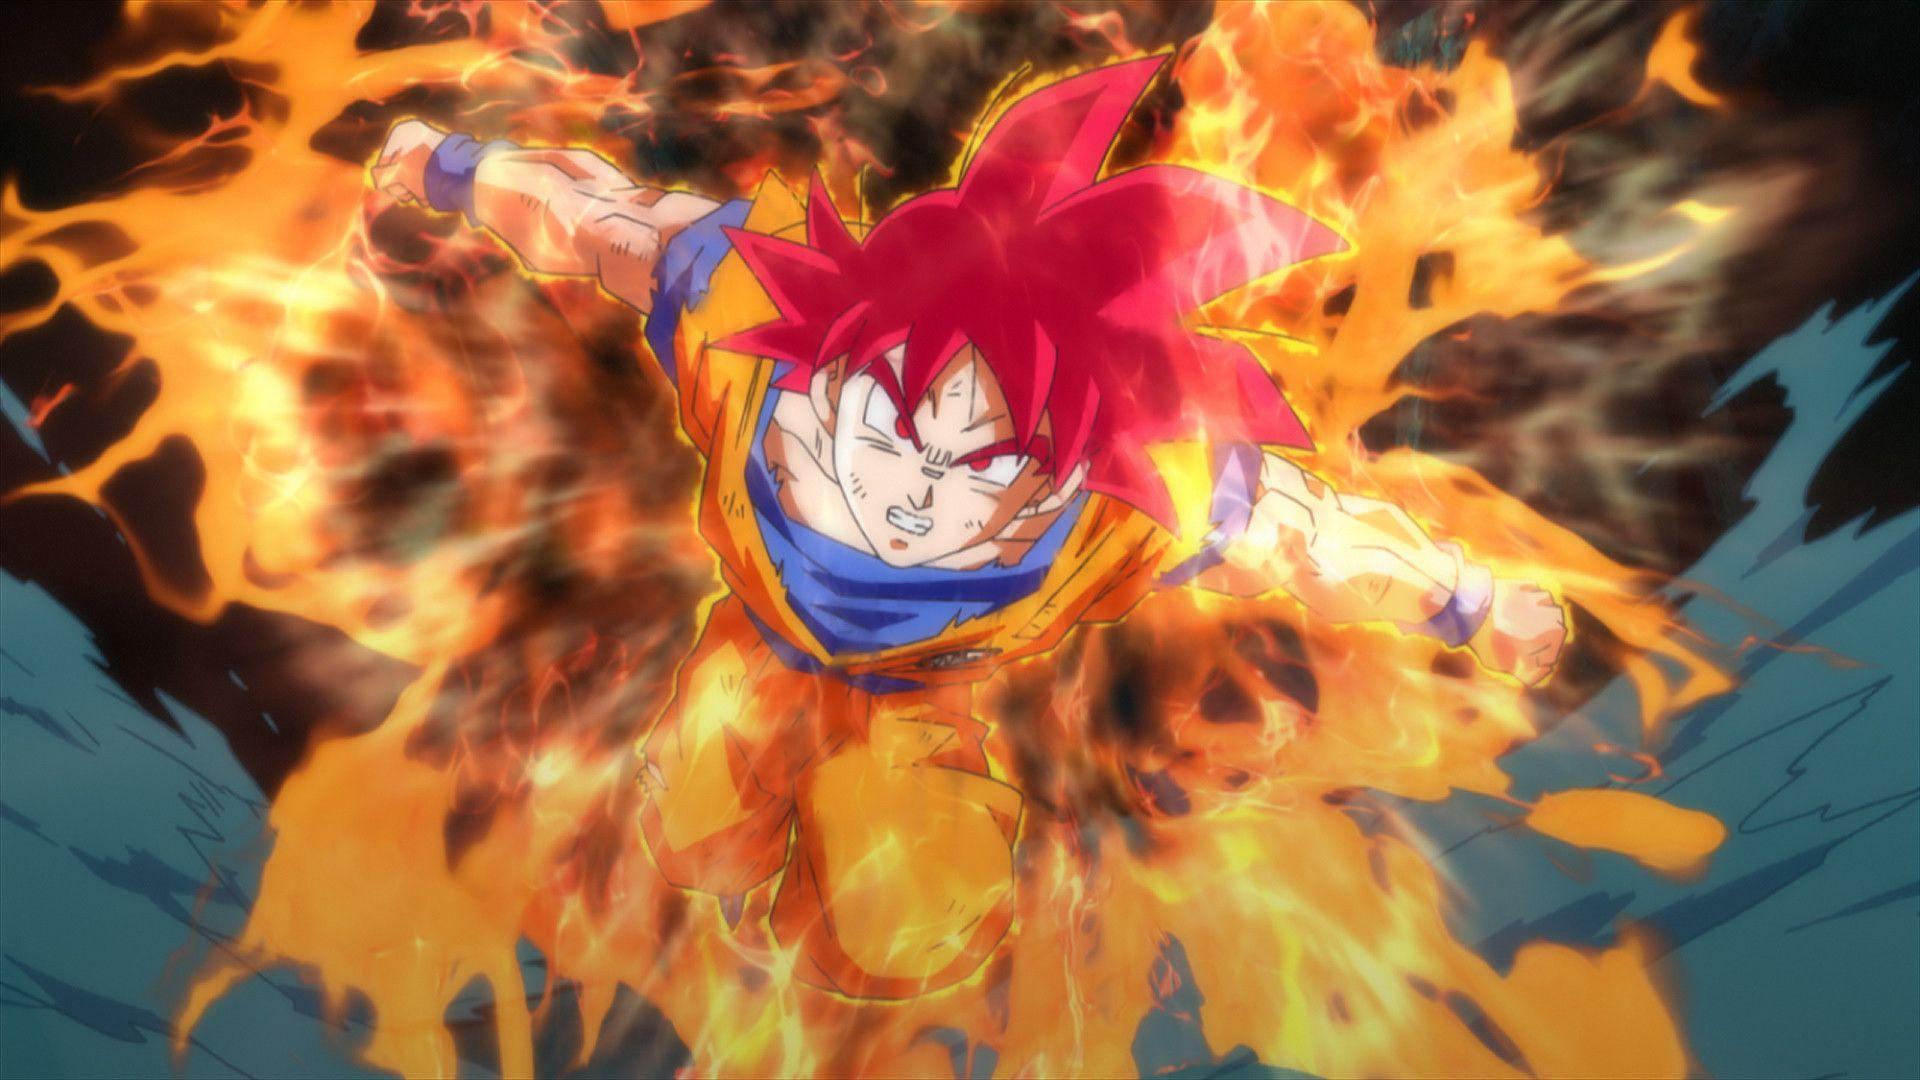 Goku Super Saiyan God Wallpaper Background